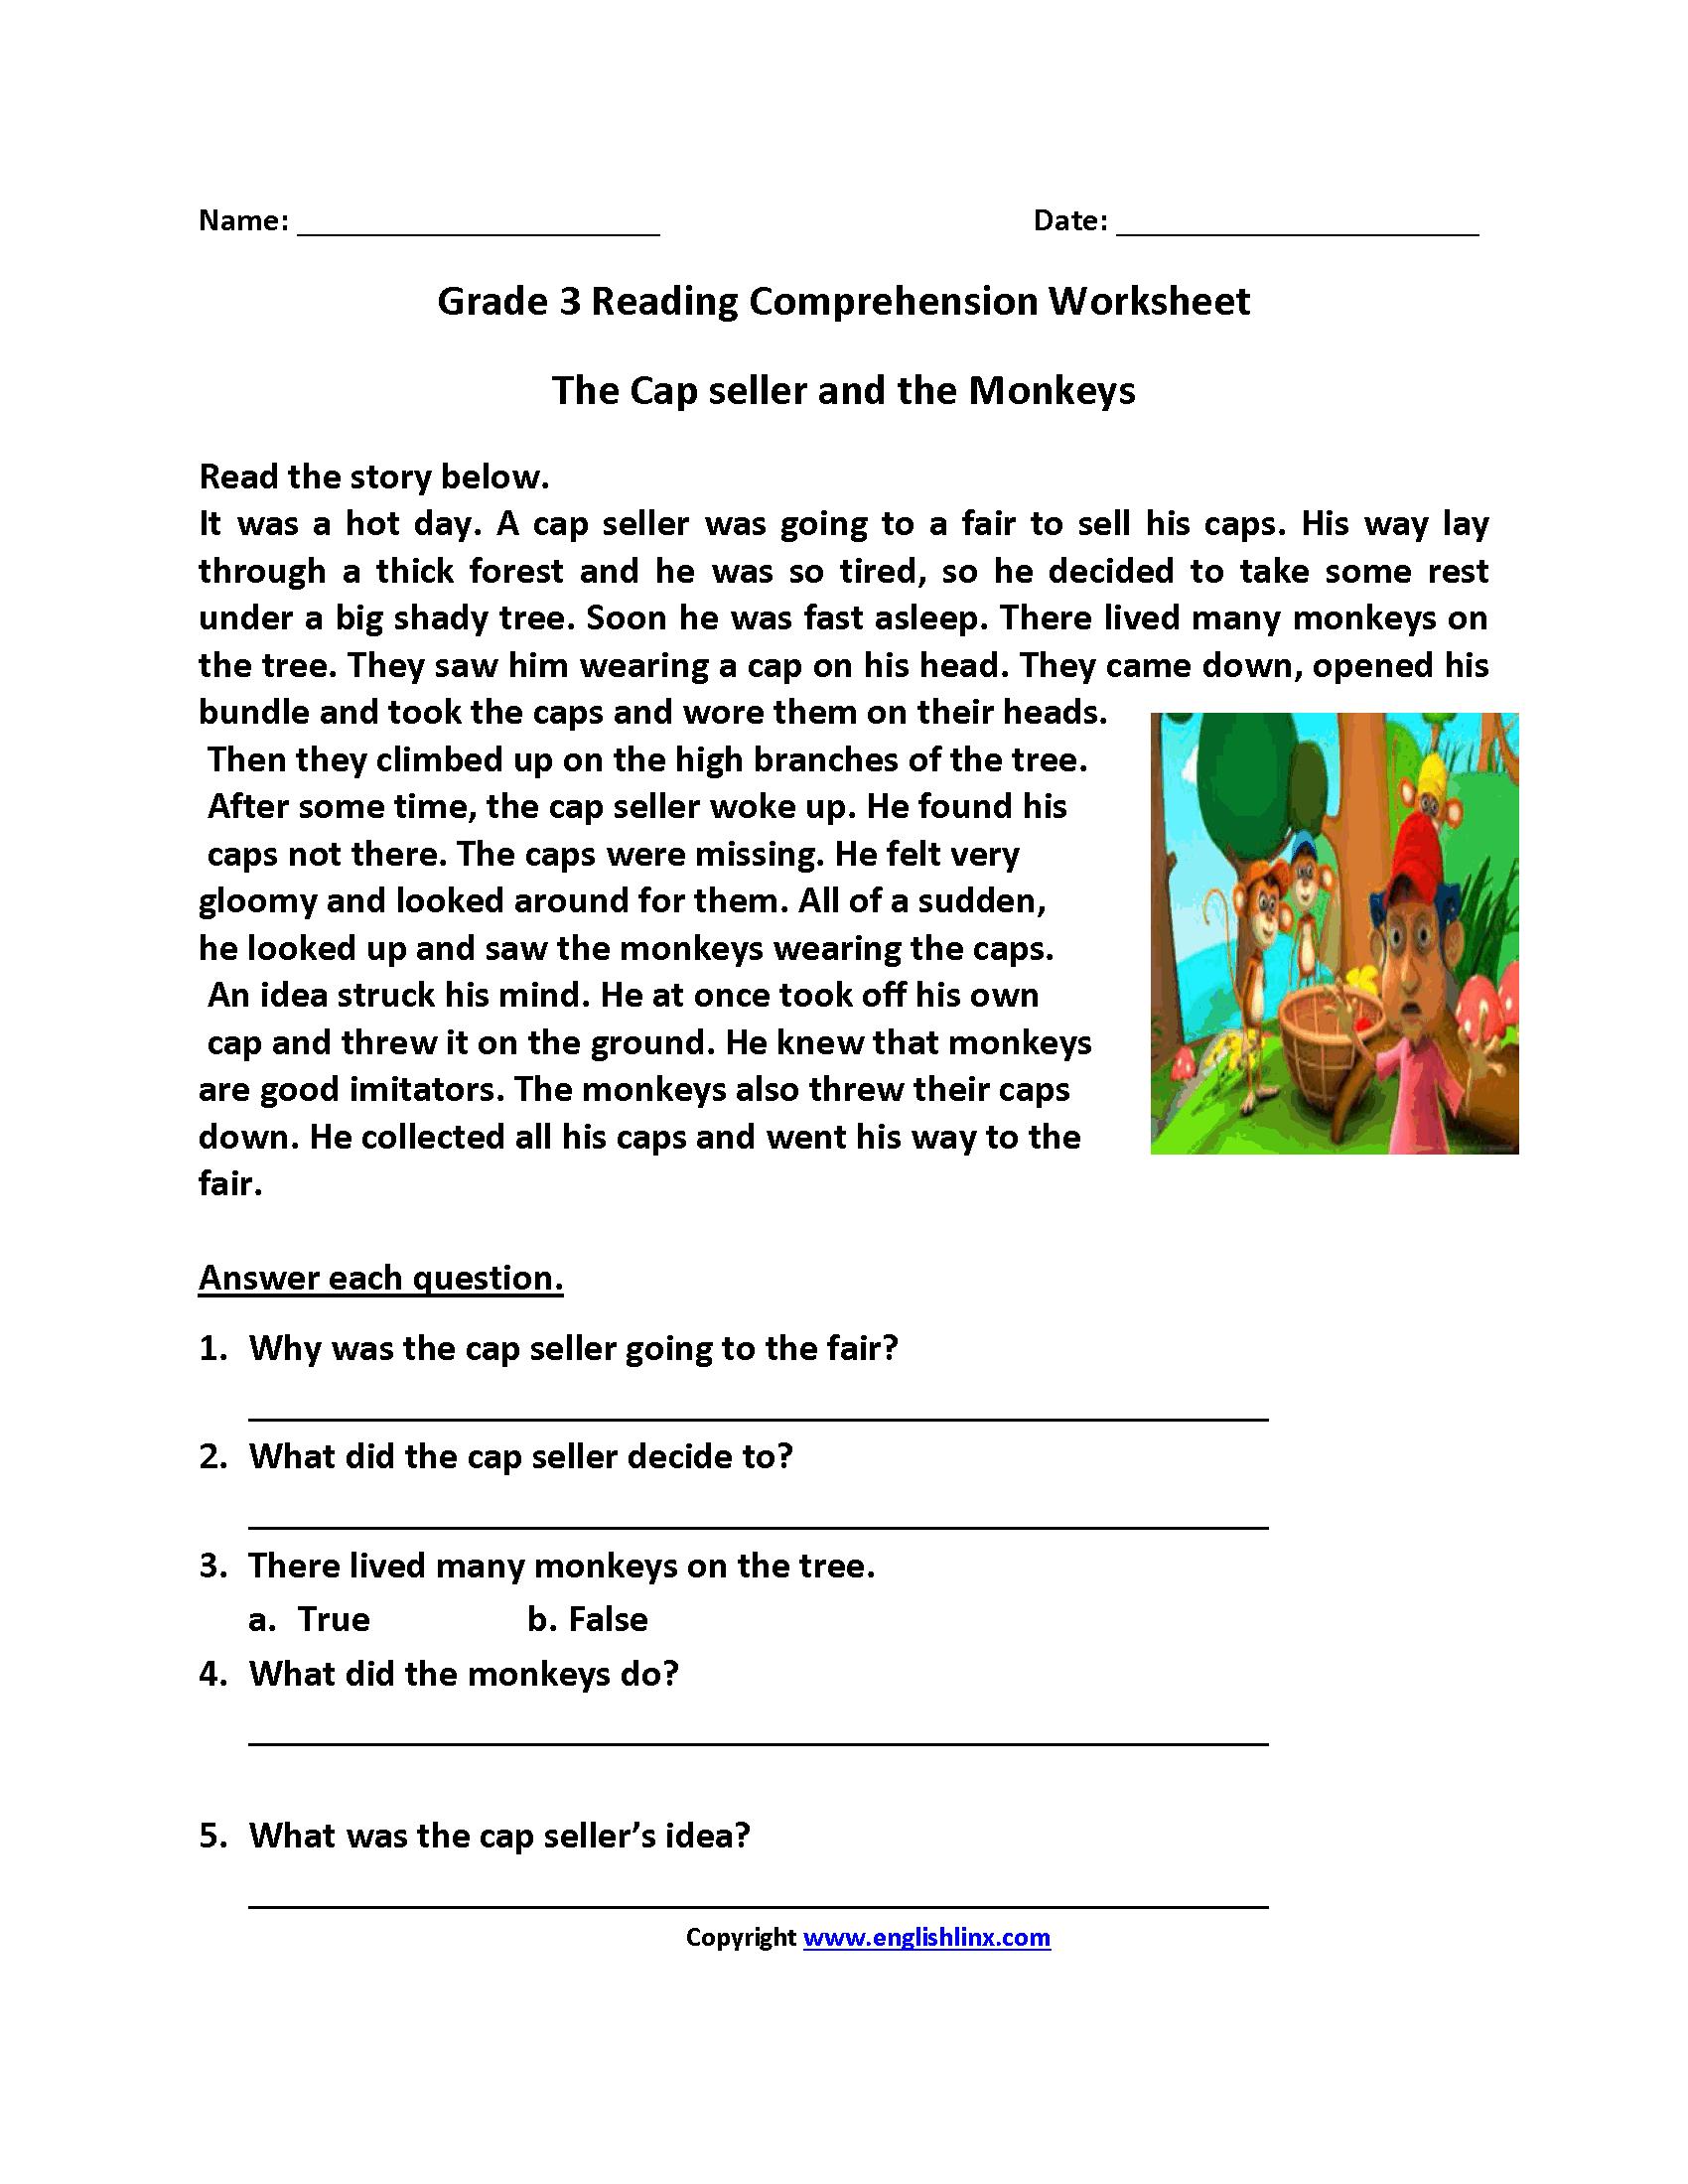 Reading Worksheets  Third Grade Reading Worksheets Intended For Printable Comprehension Worksheets For Grade 3